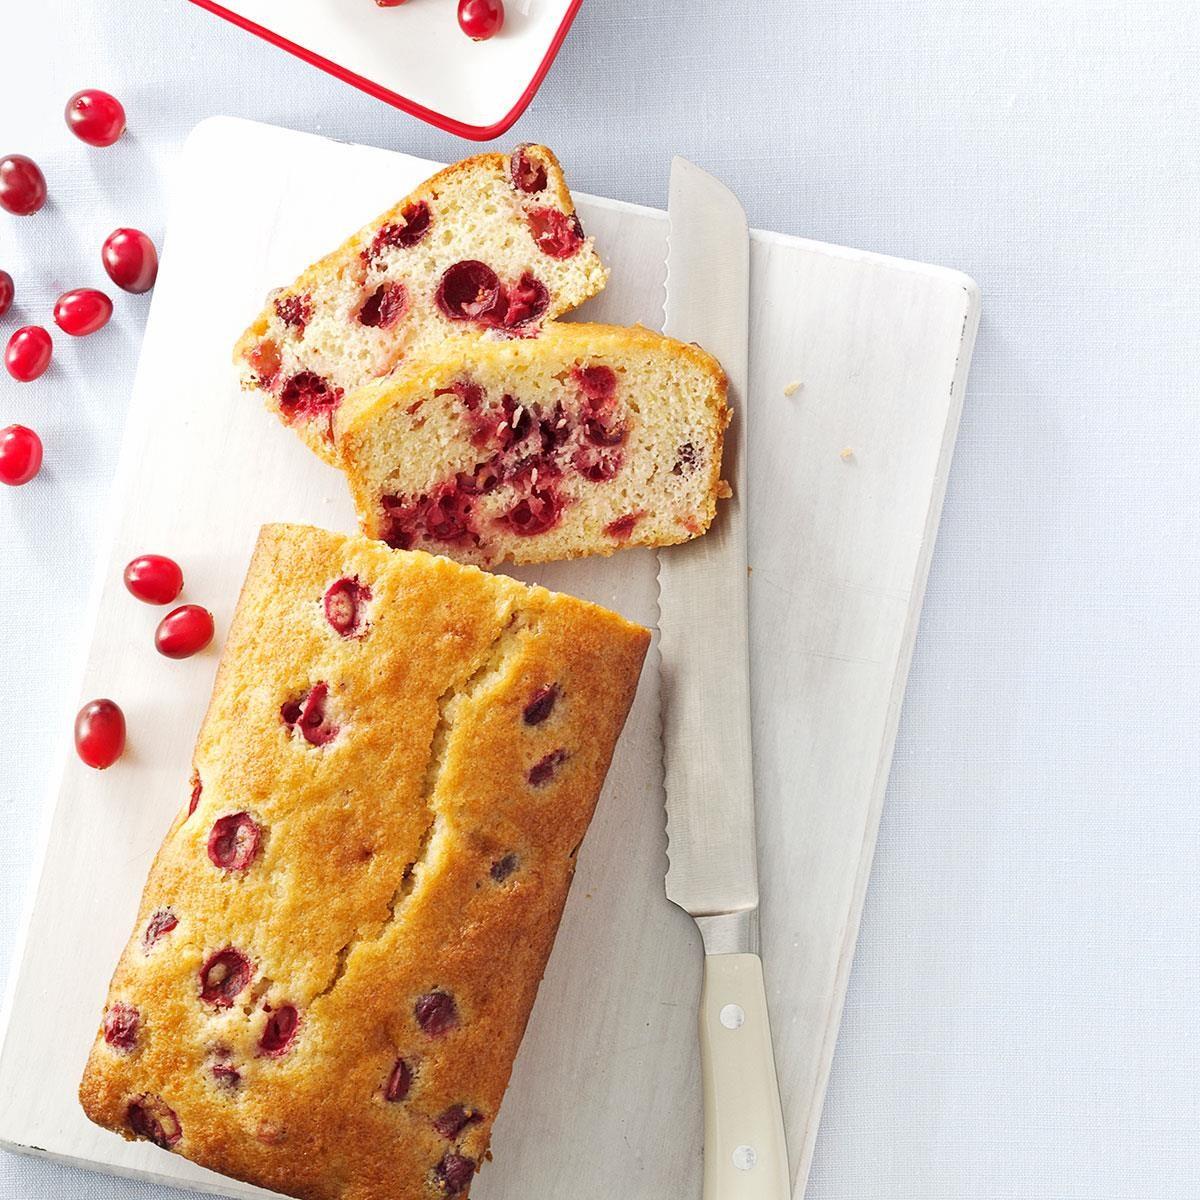 Tart Cranberry Quick Bread recipe